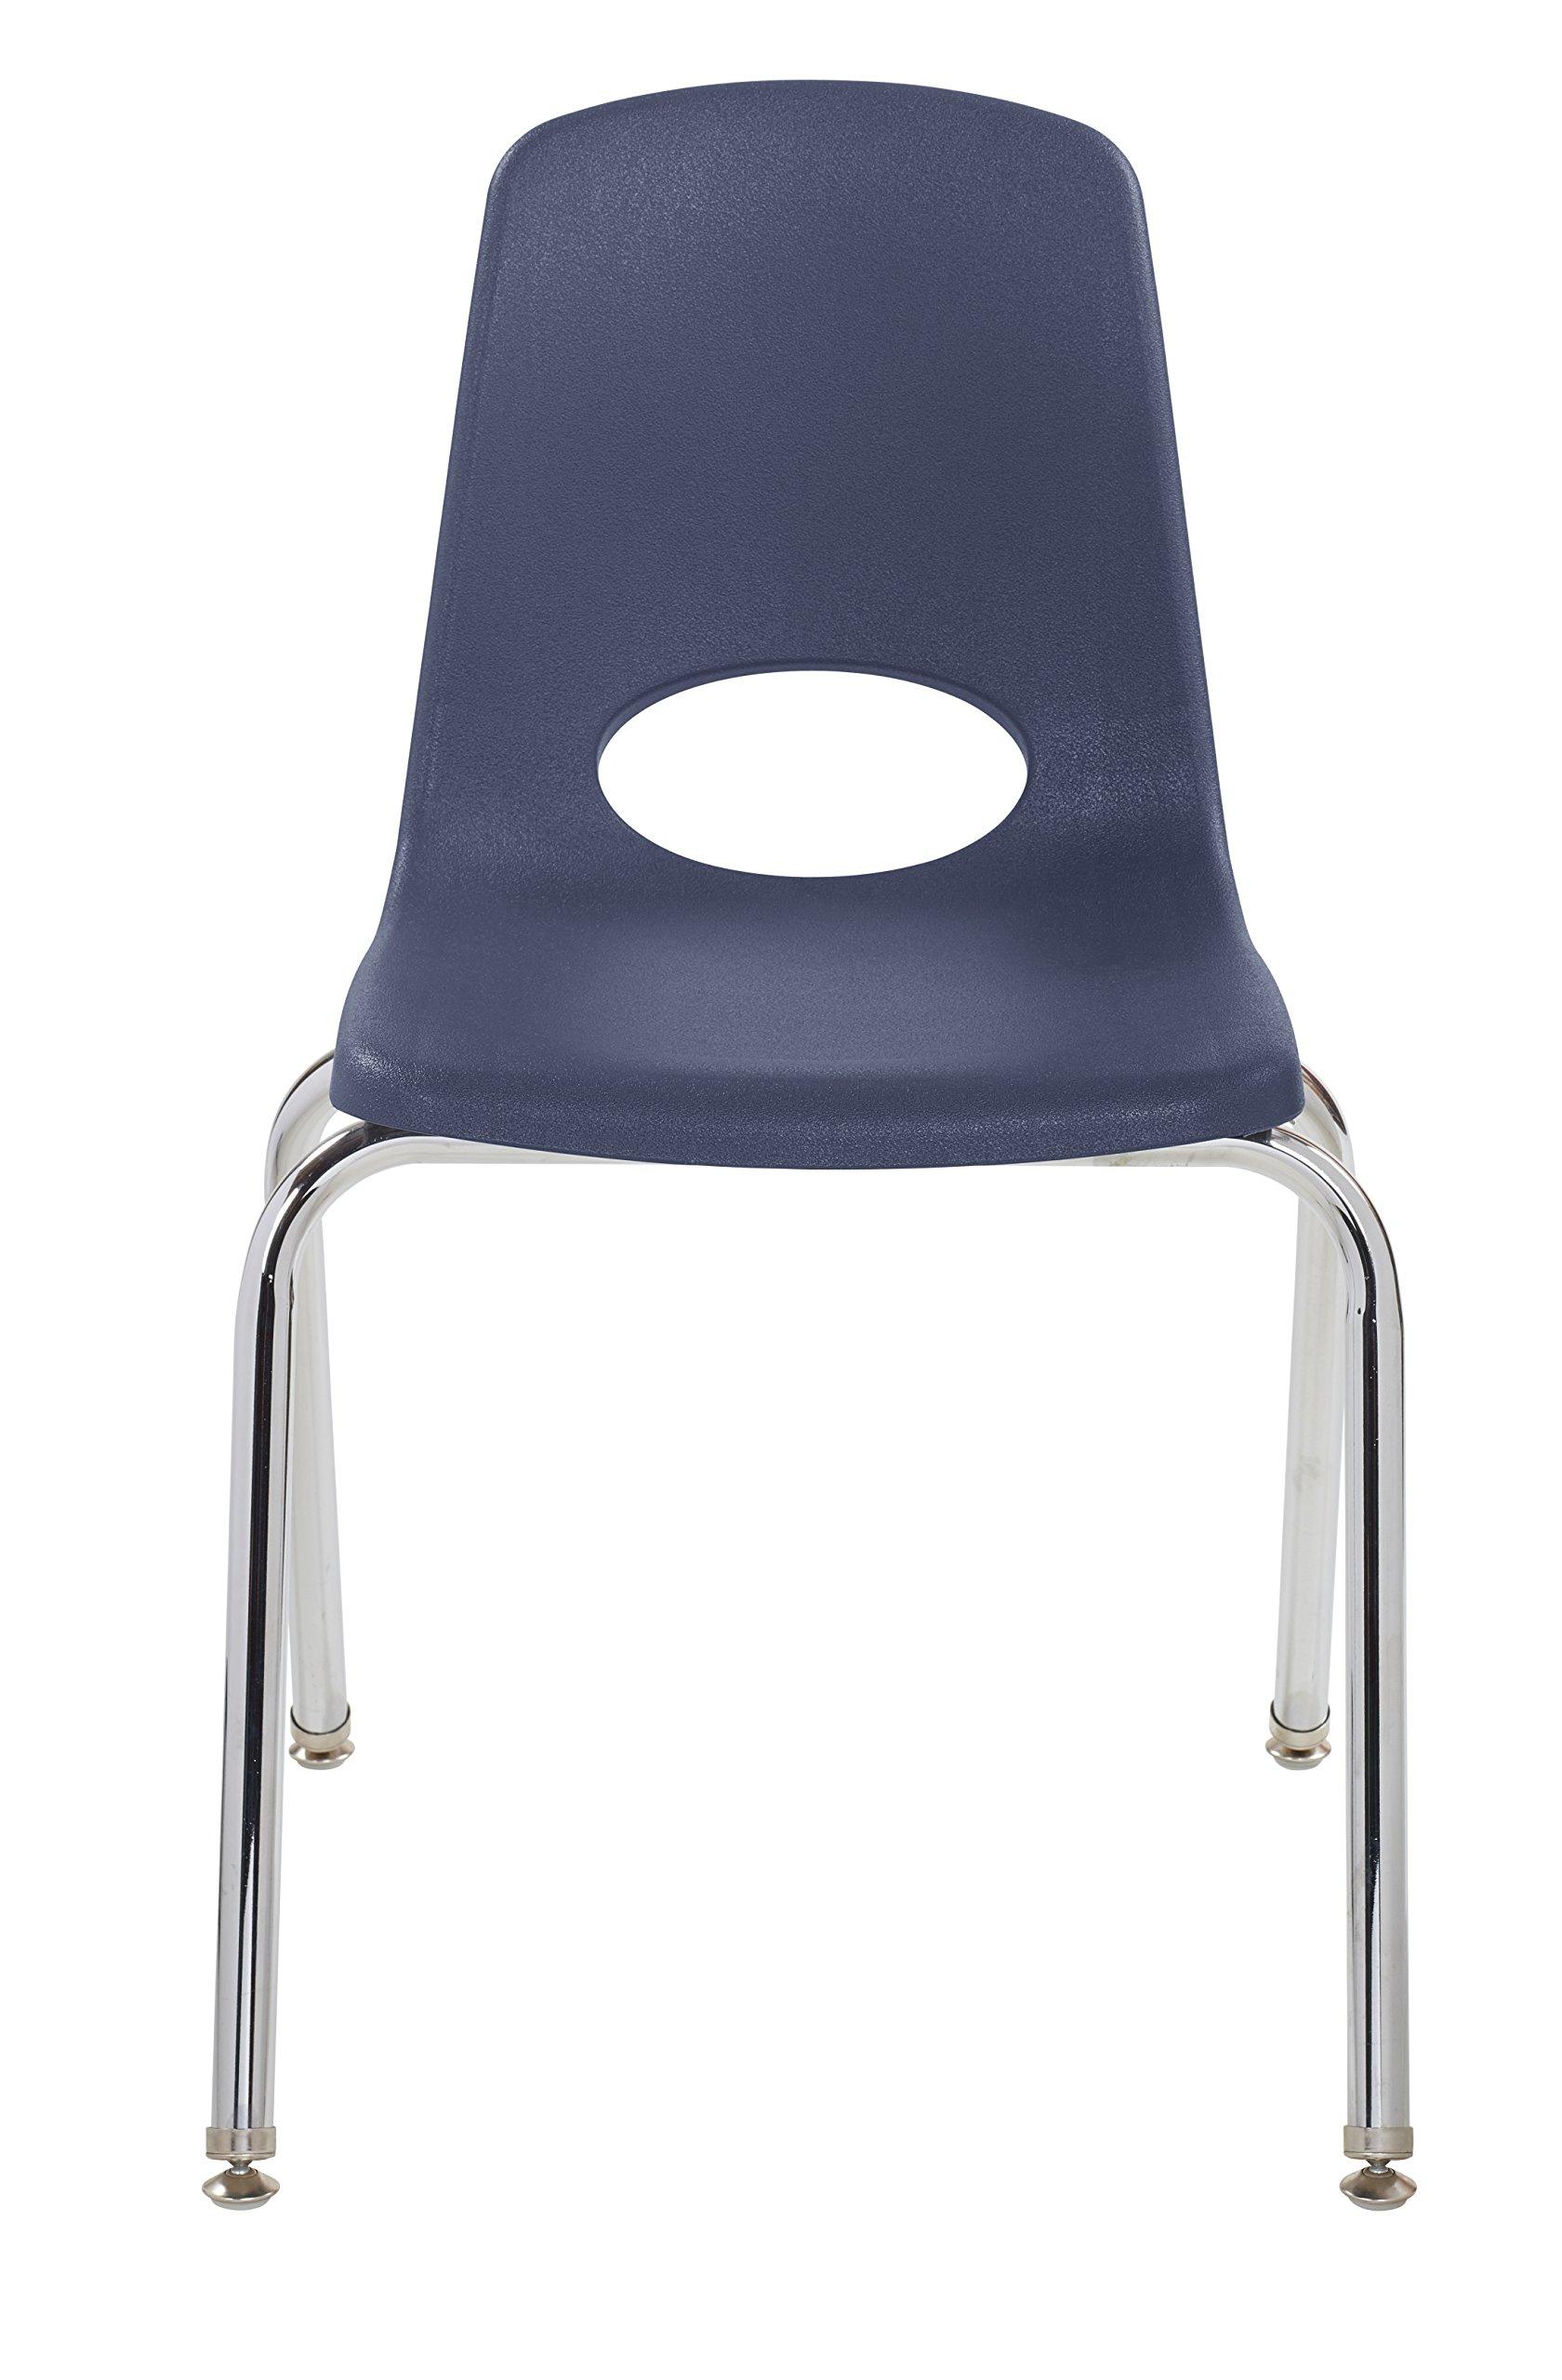 ECR4Kids 18'' School Stack Chair, Chrome Legs with Nylon Swivel Glides, Navy (5-Pack) by ECR4Kids (Image #4)